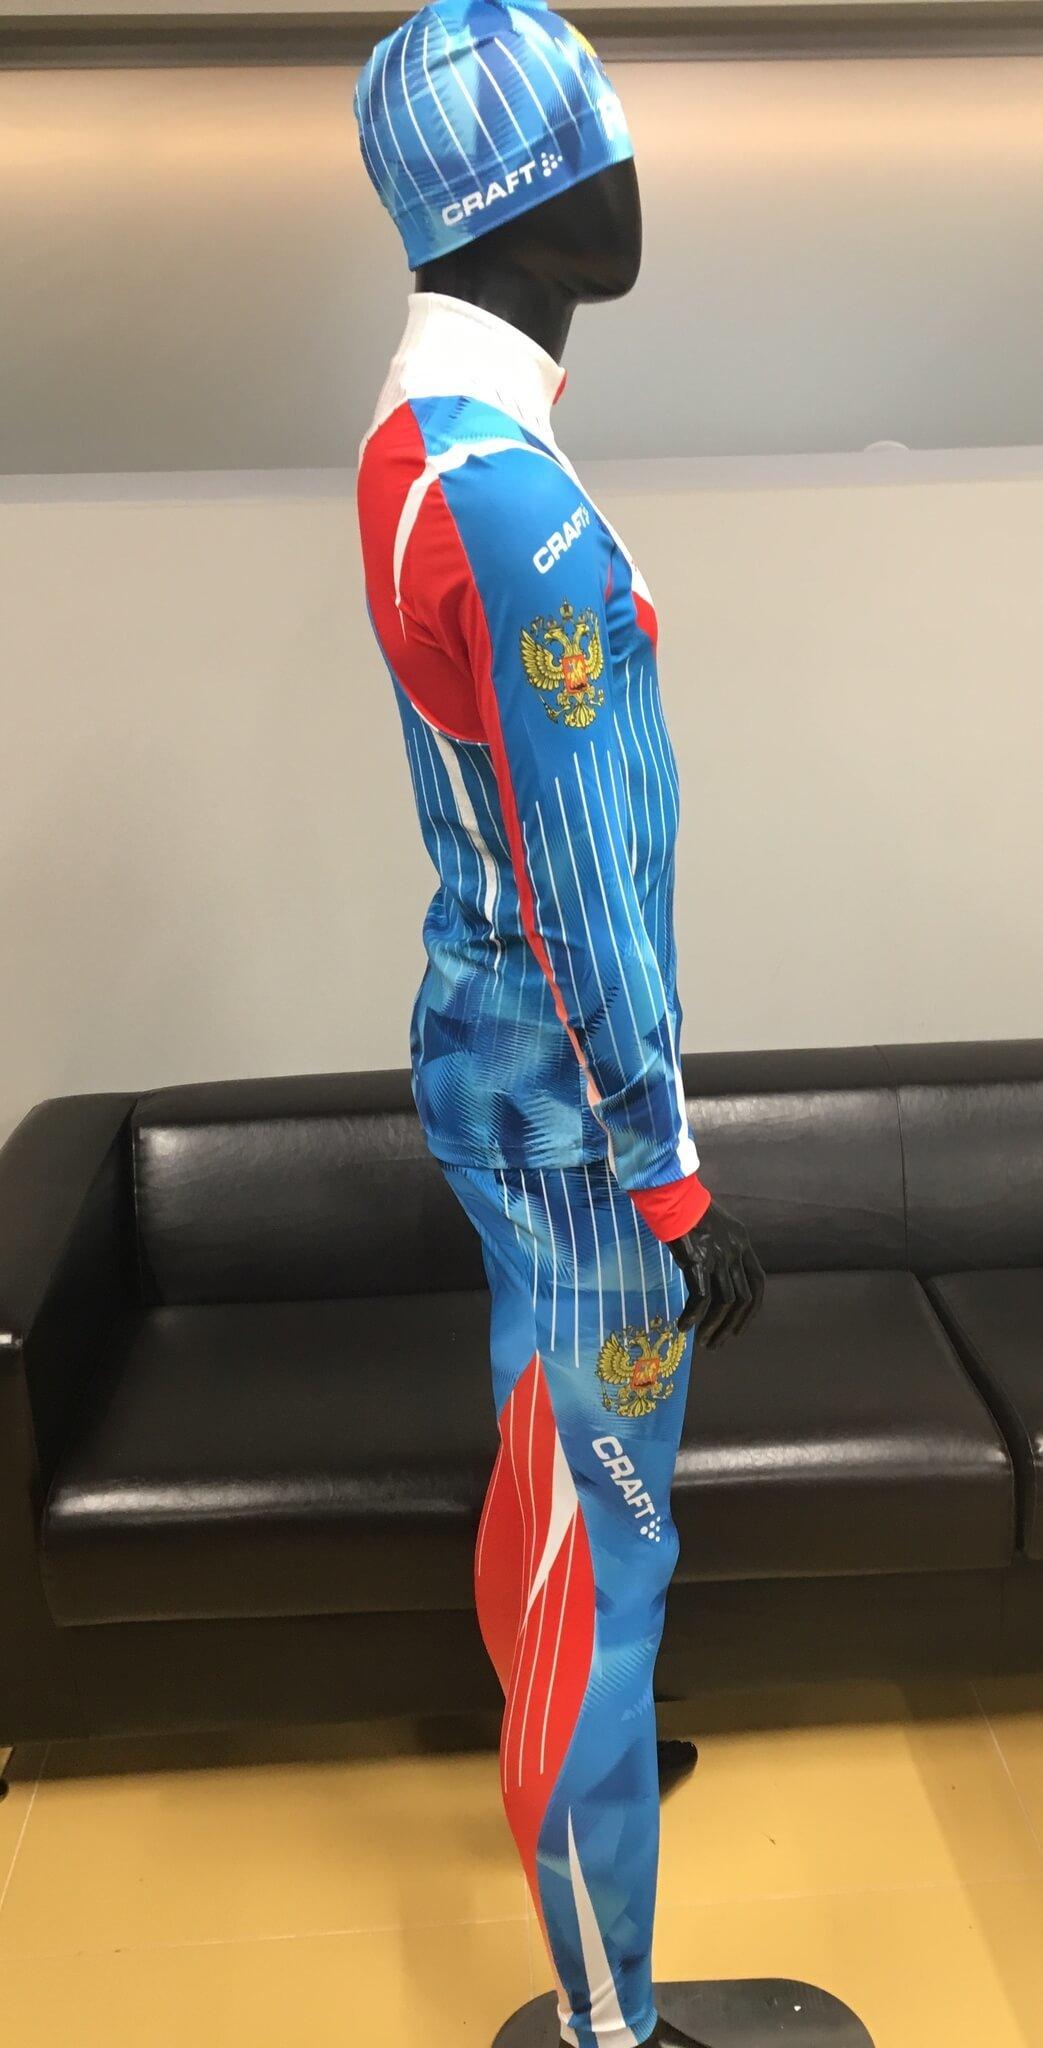 Элитный гоночный комбинезон Craft Ski Team Russia - 4